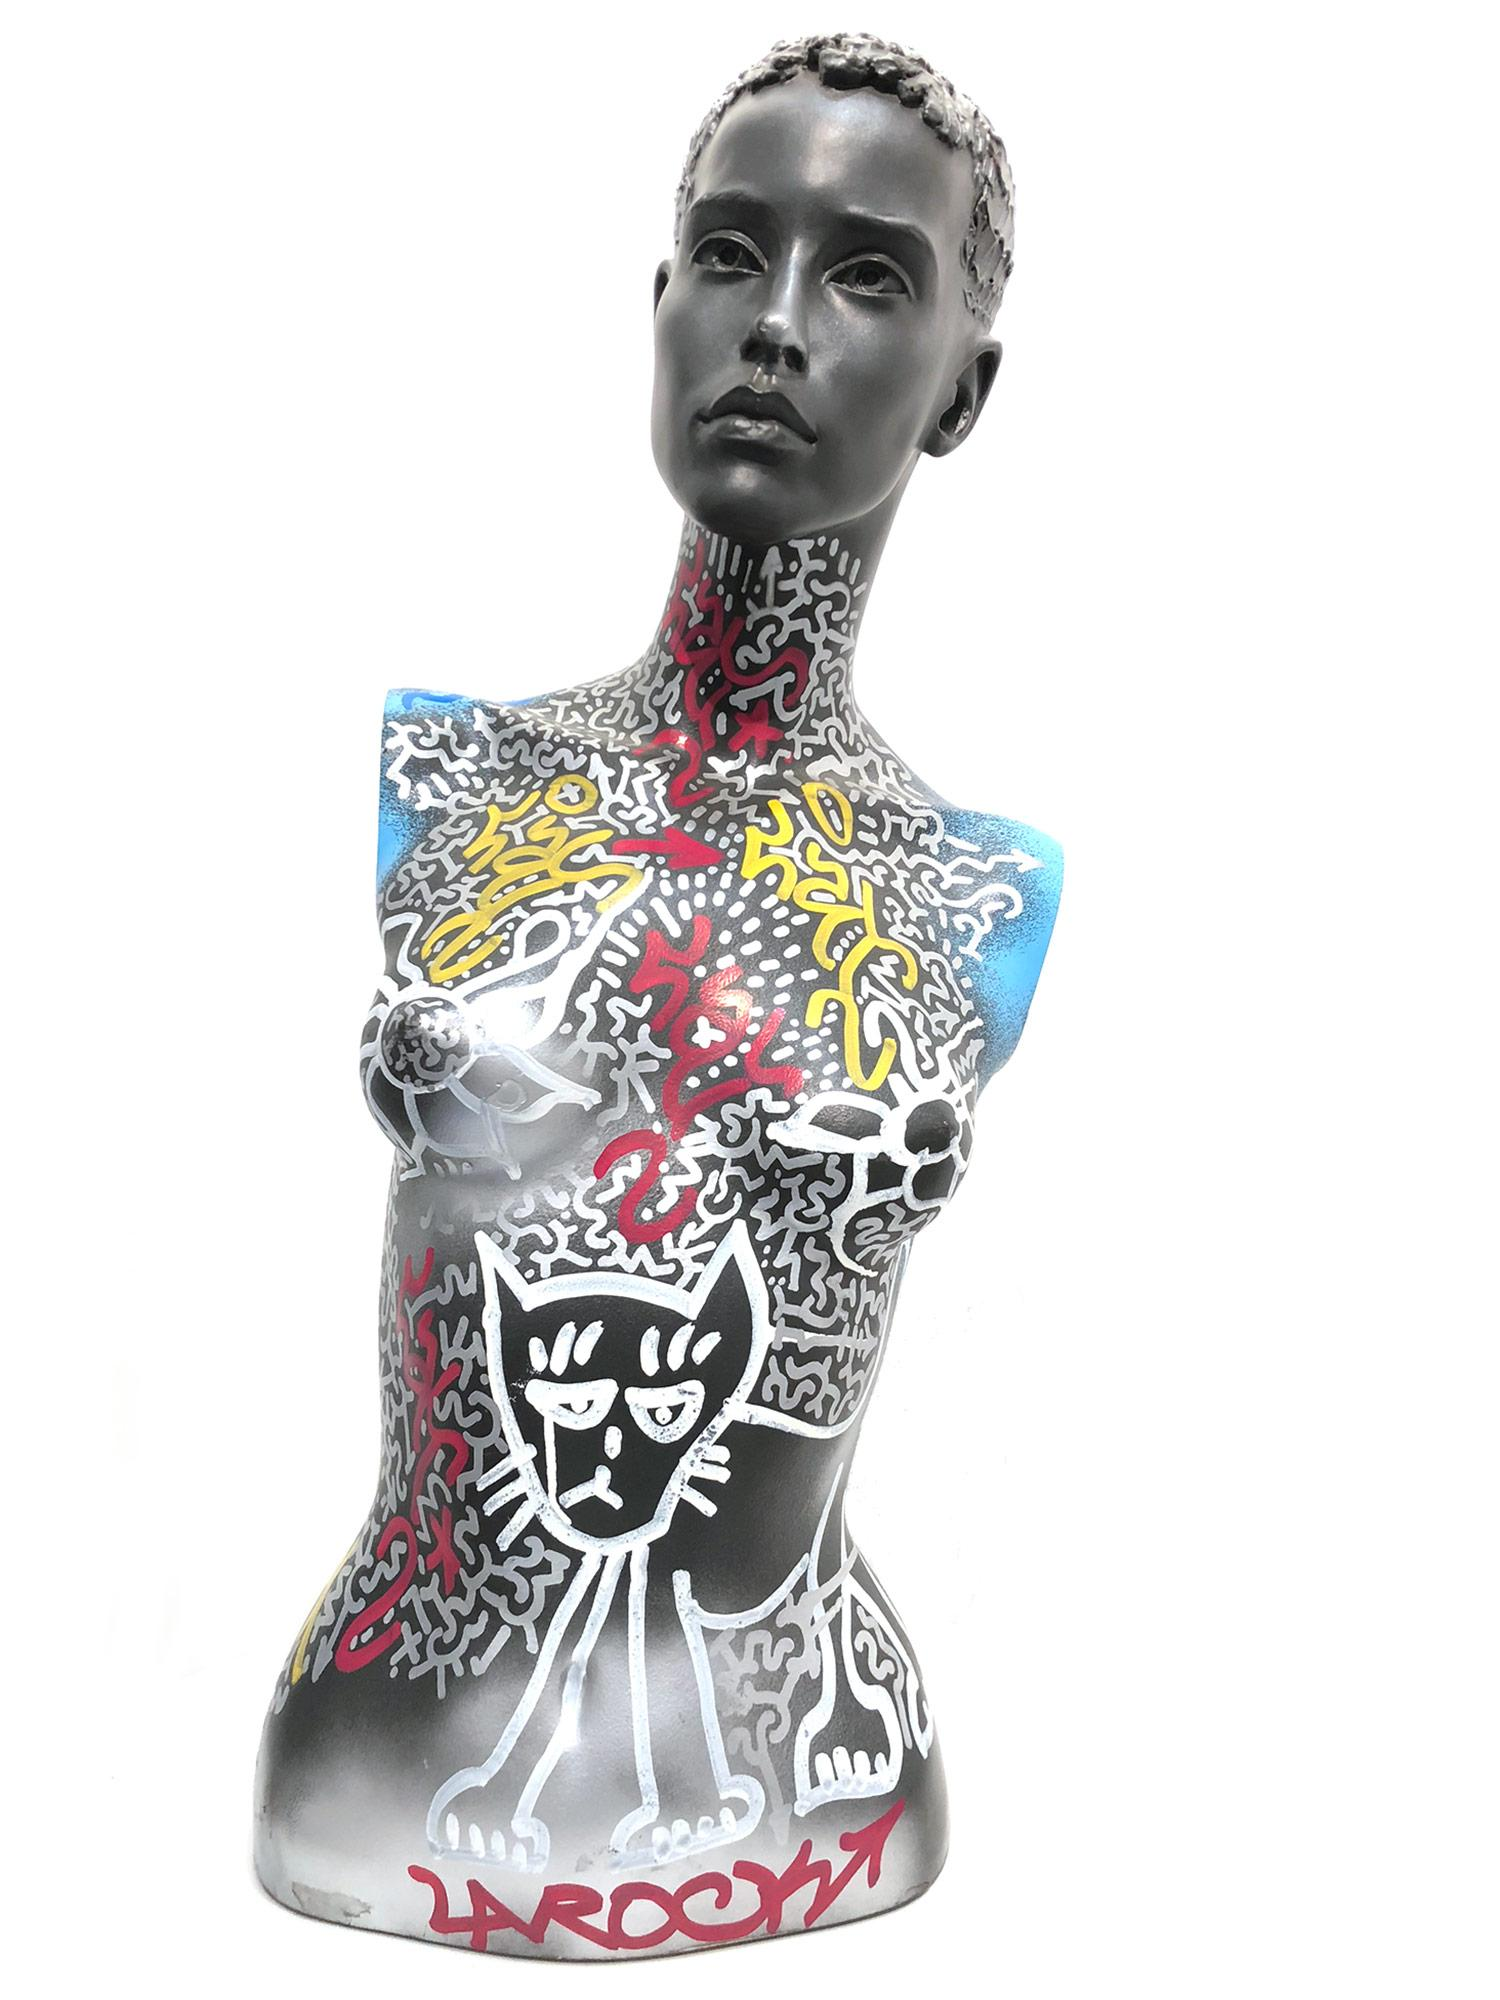 """LA ROC Cat Woman"" Decorated Graffiti Street Art Mannequin Bust Sculpture"